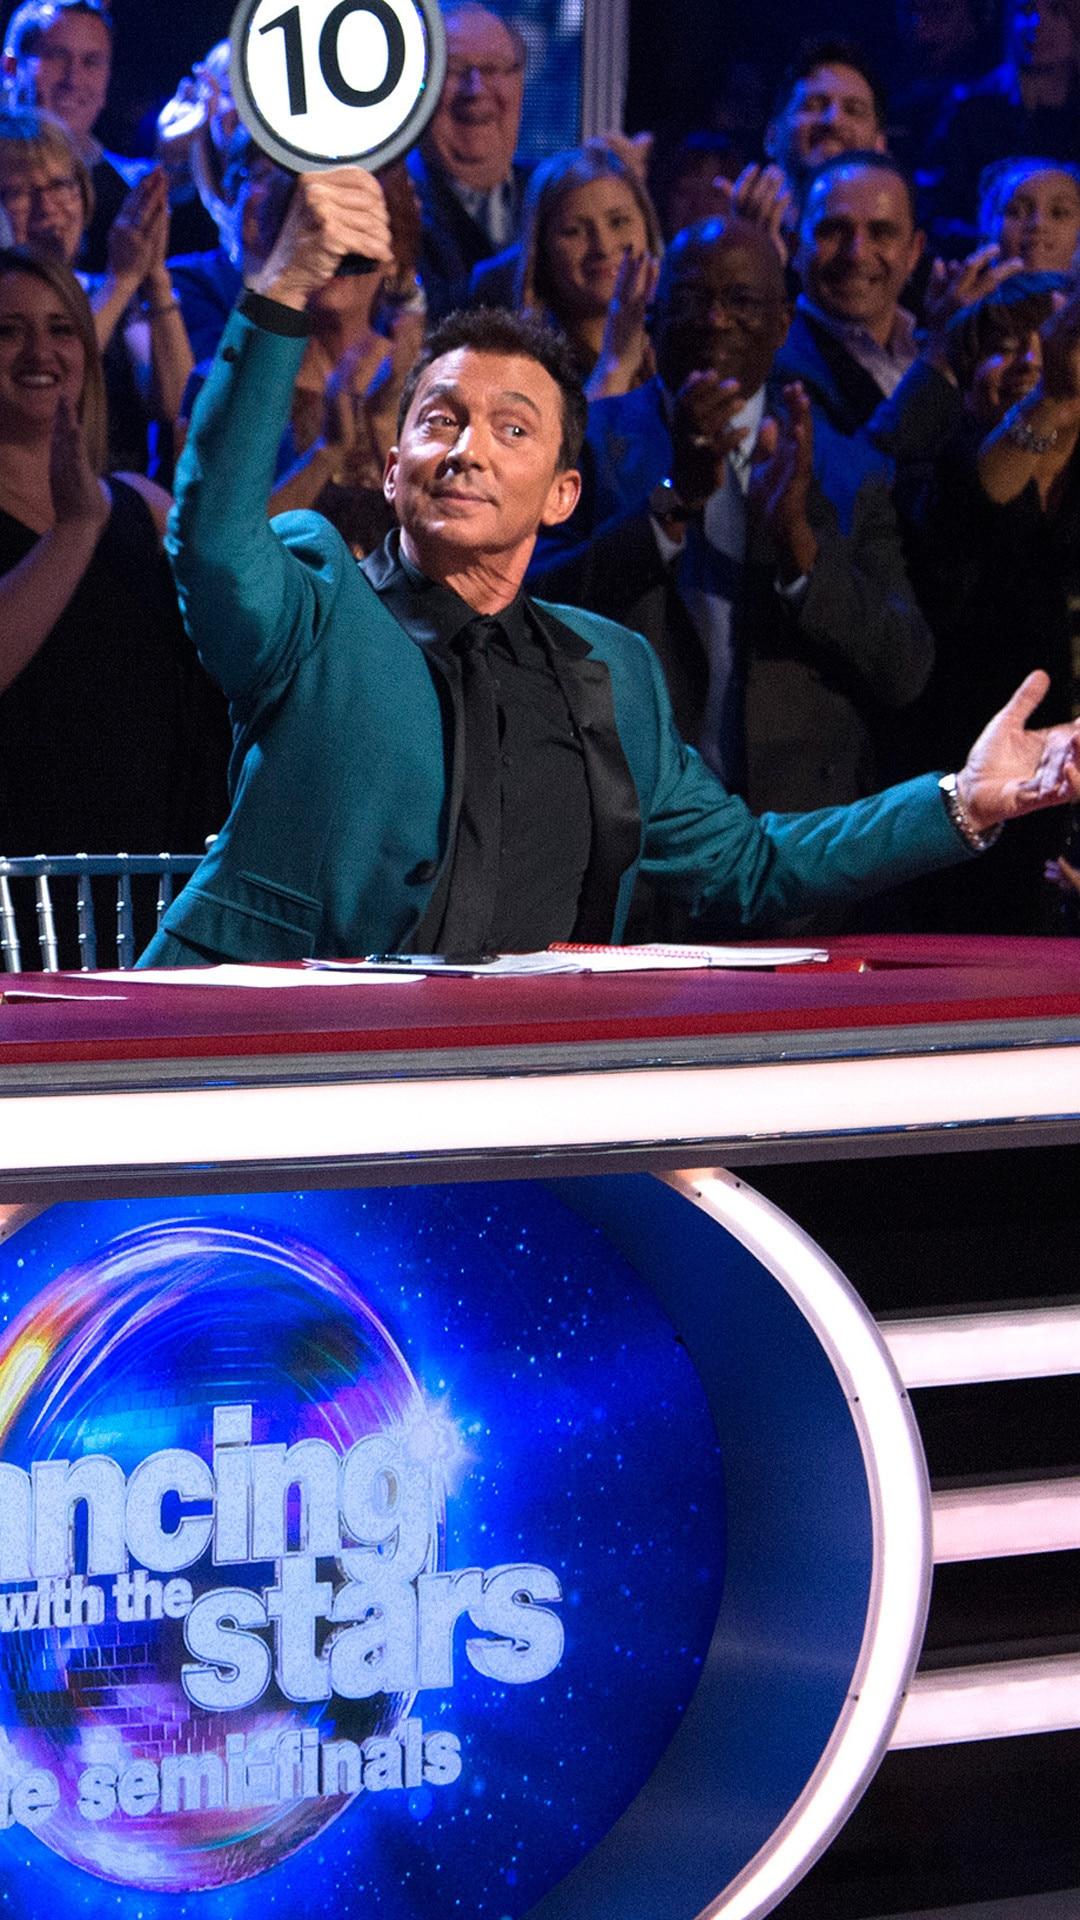 Dancing With the Stars, Bruno Tonioli, Season 25